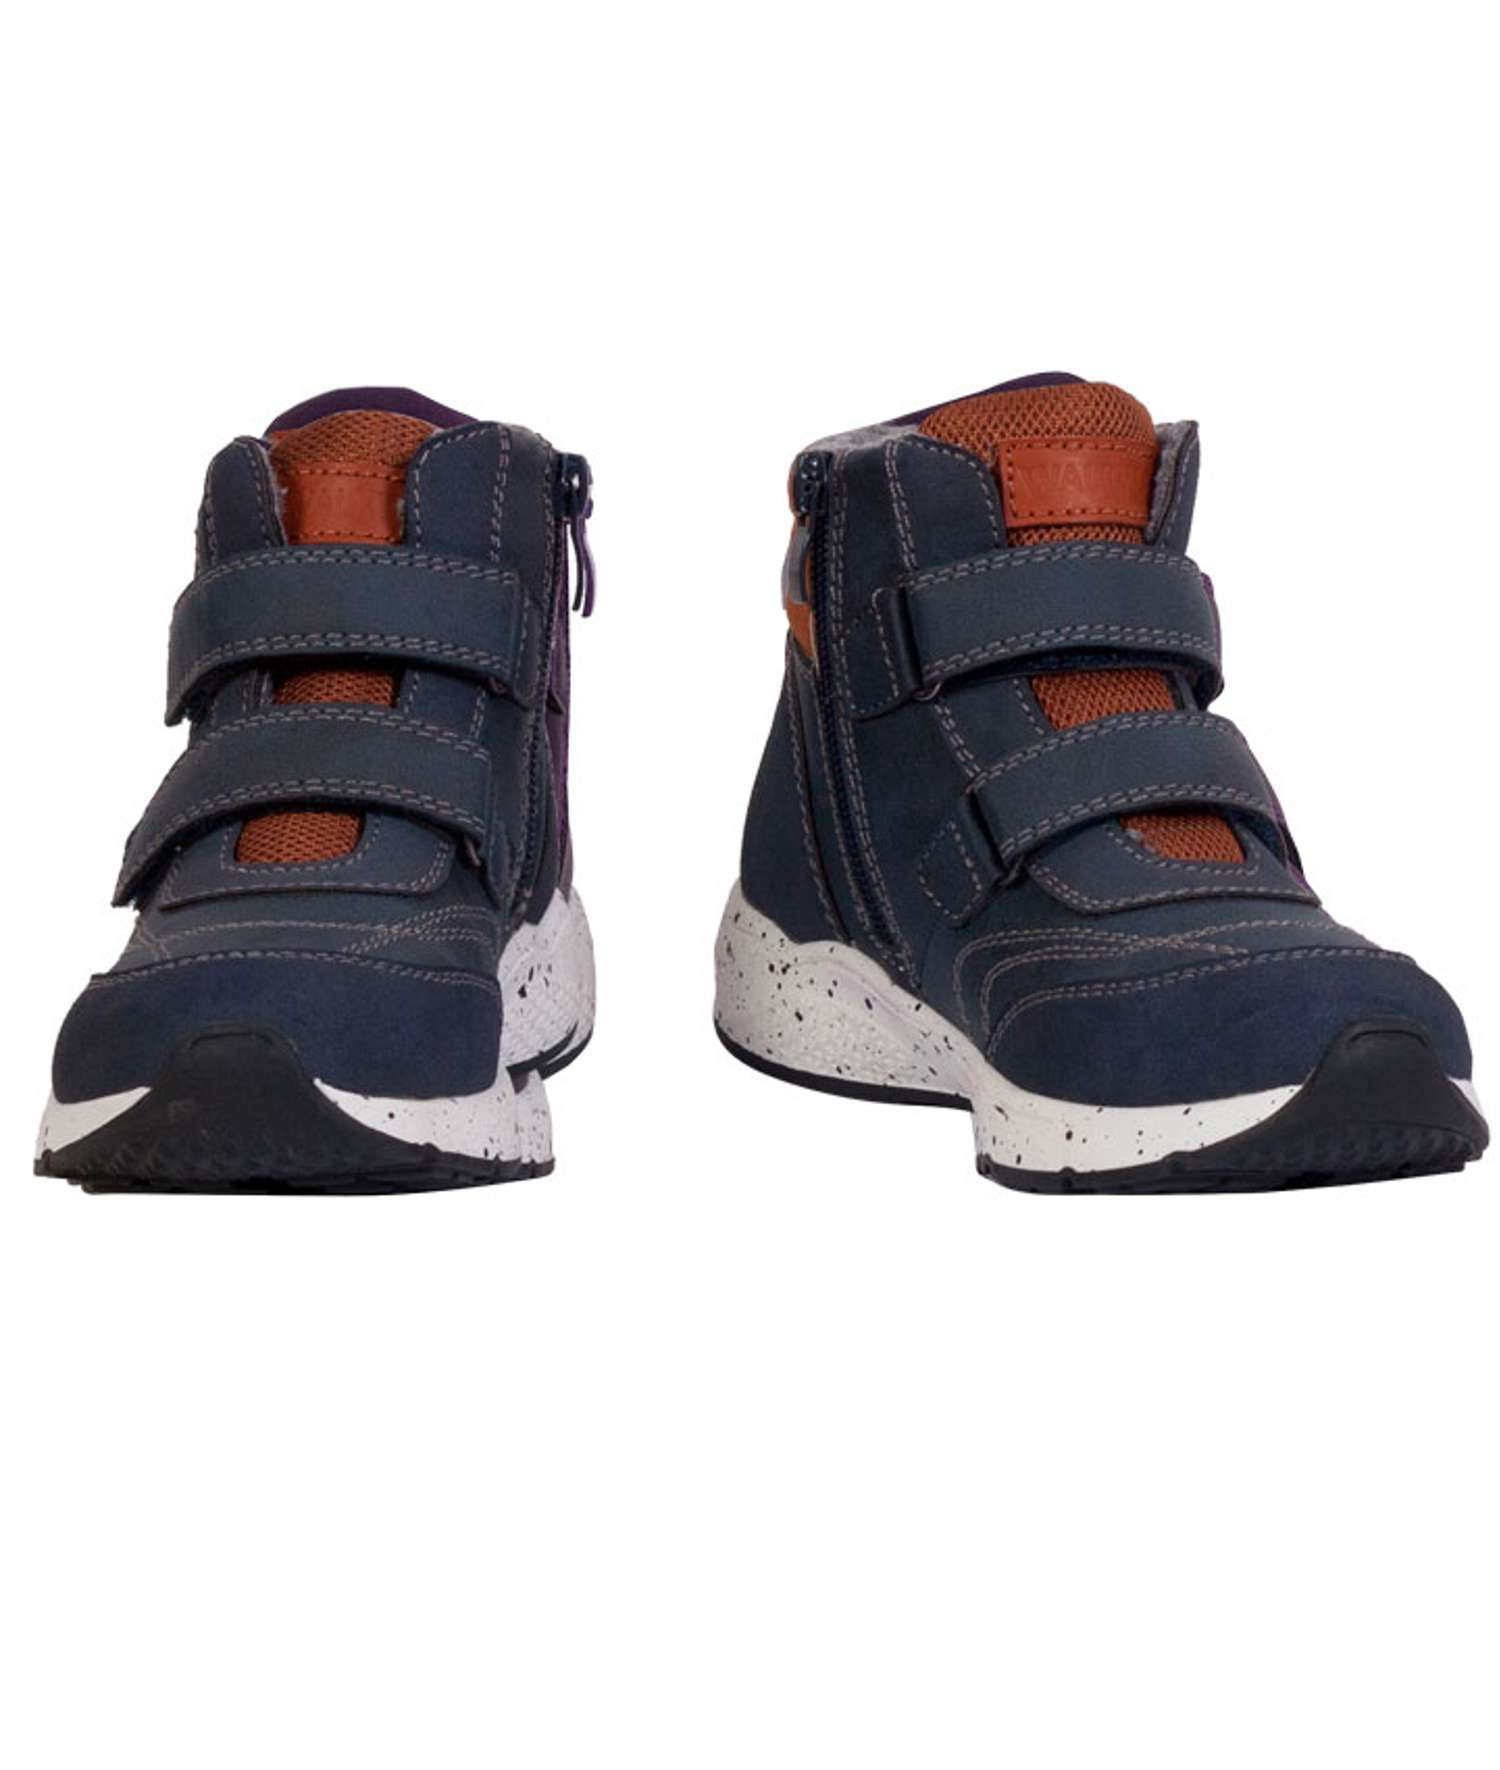 Walkway - Akako børne vinter sneakers - Mørkeblå - Størrelse 26